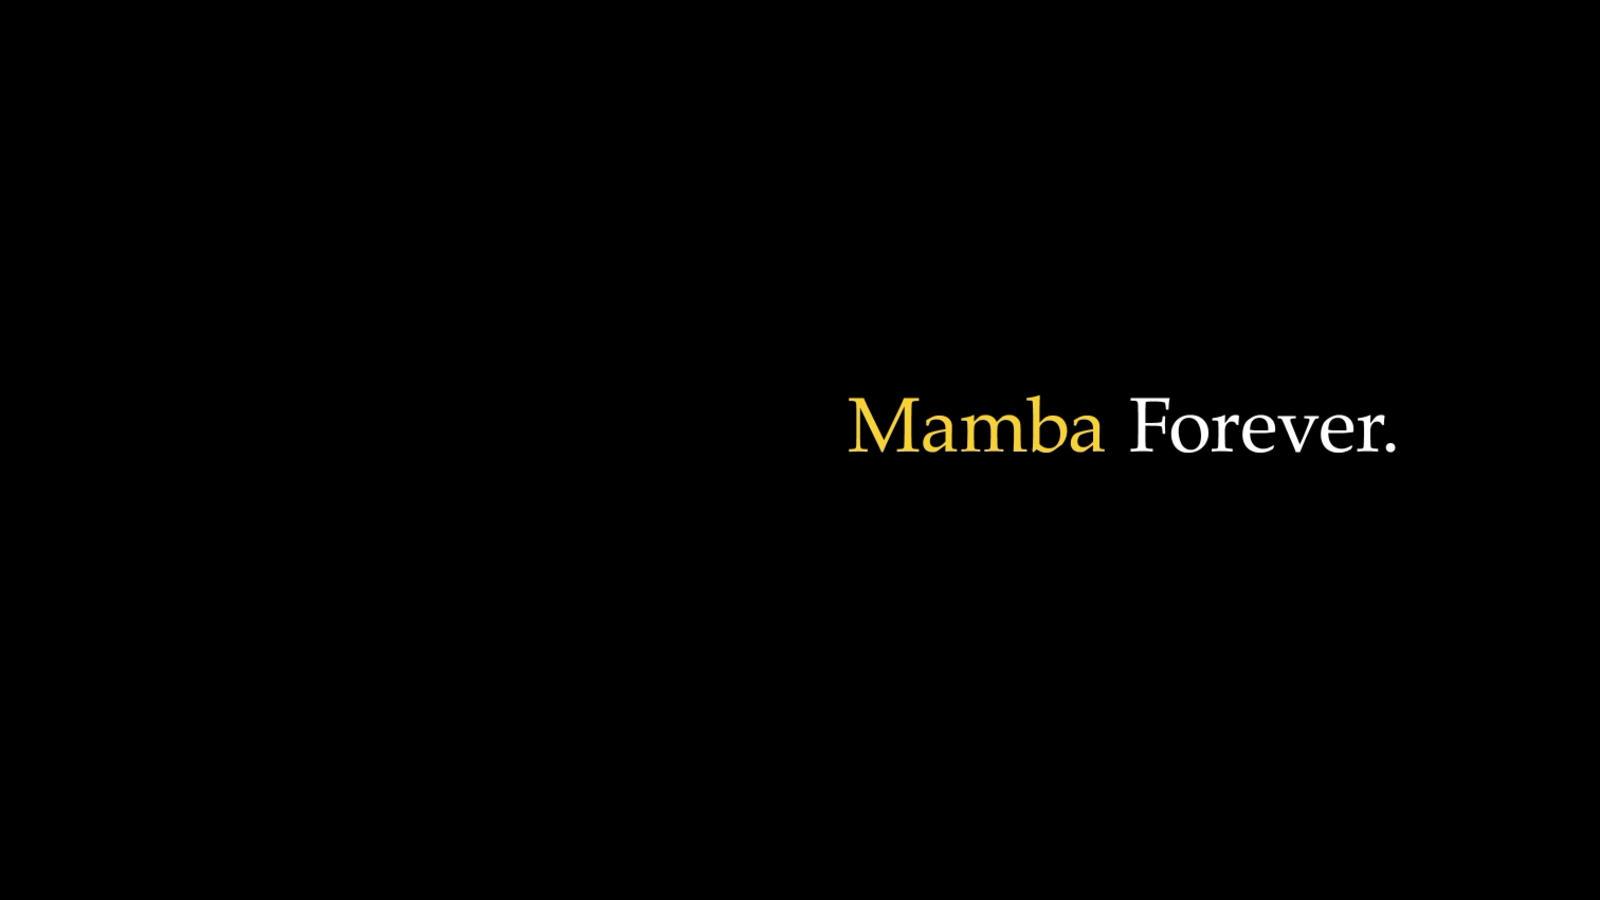 mamba-forever-nike-film